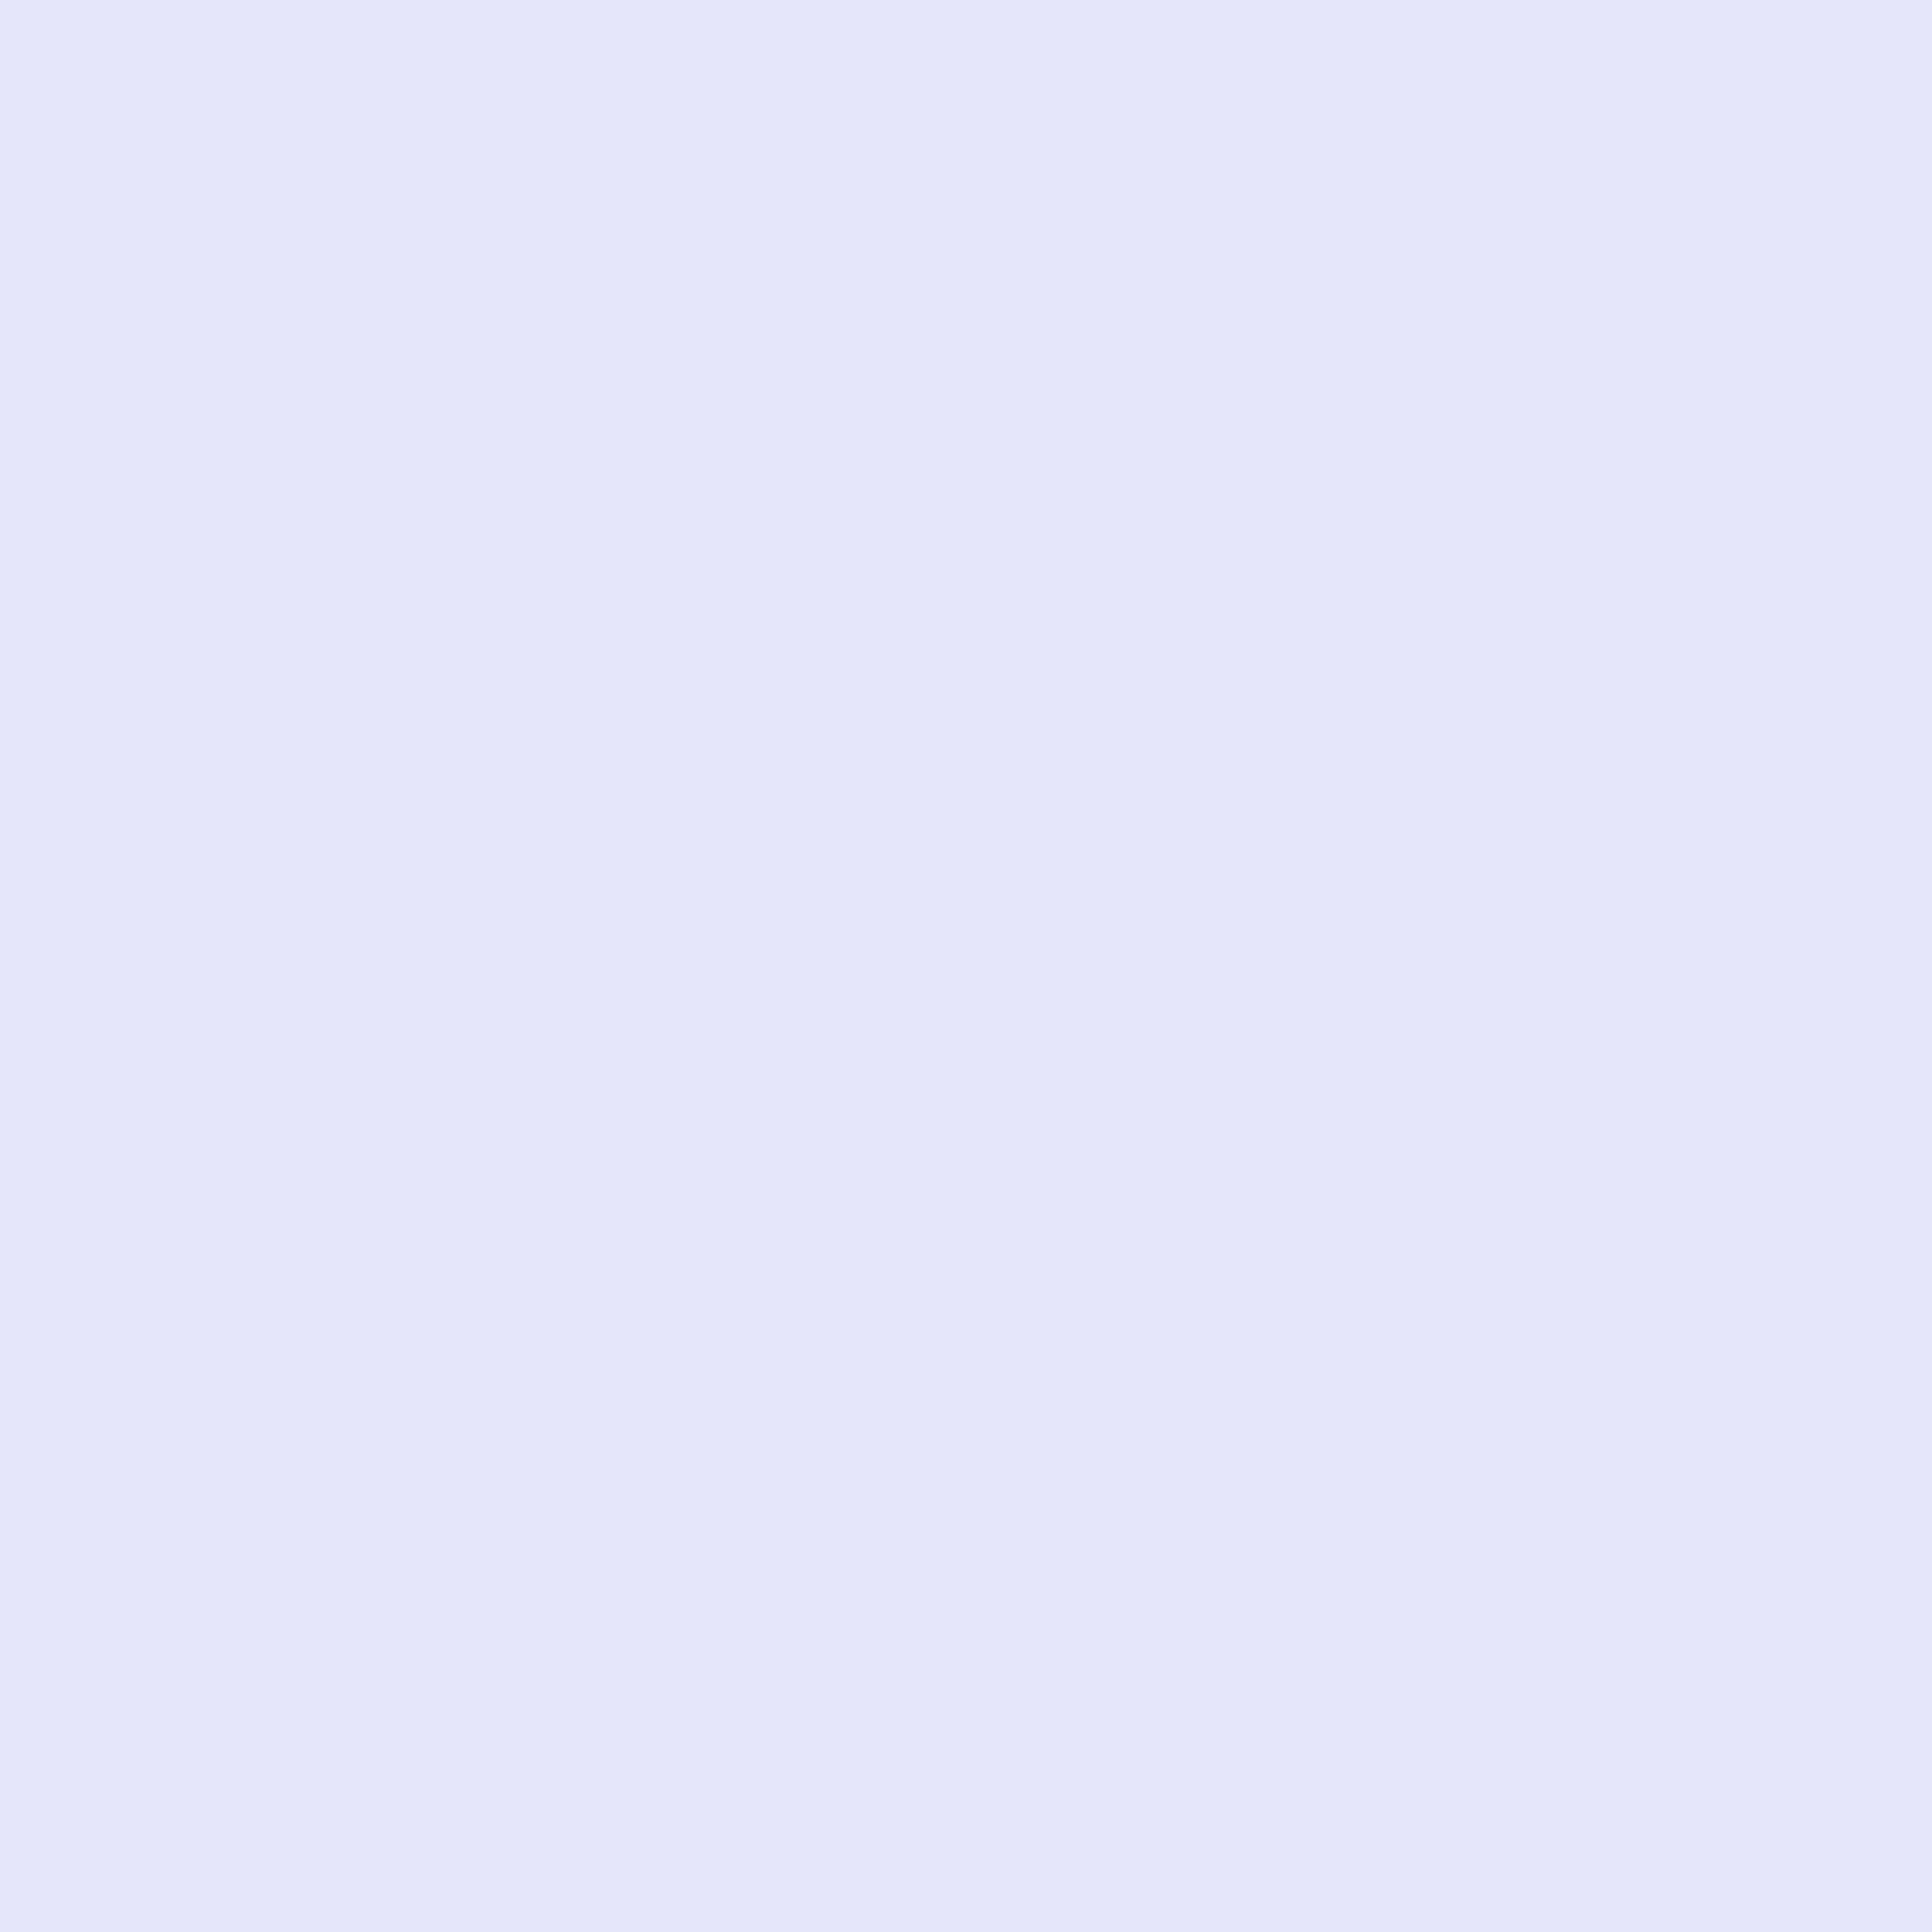 2732x2732 Lavender Web Solid Color Background